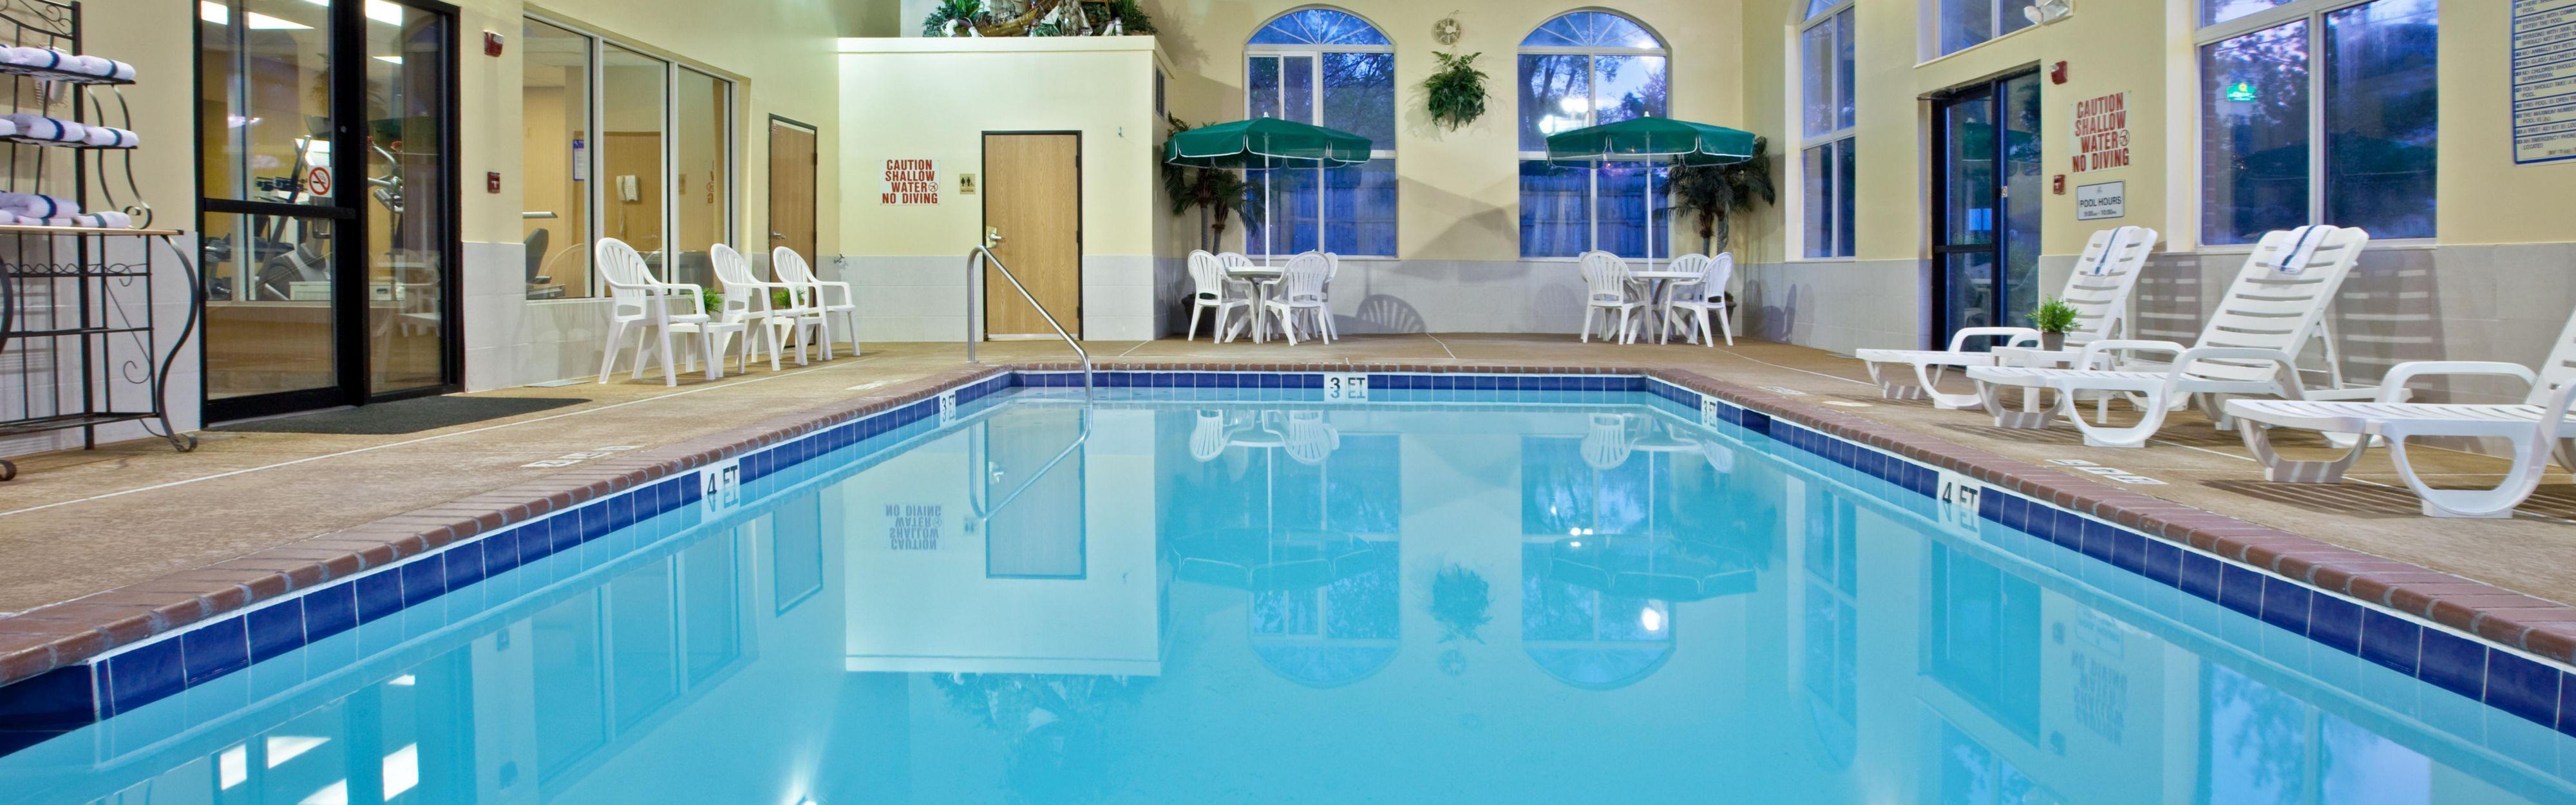 Holiday Inn Express  U0026 Suites Cincinnati Sharonville At